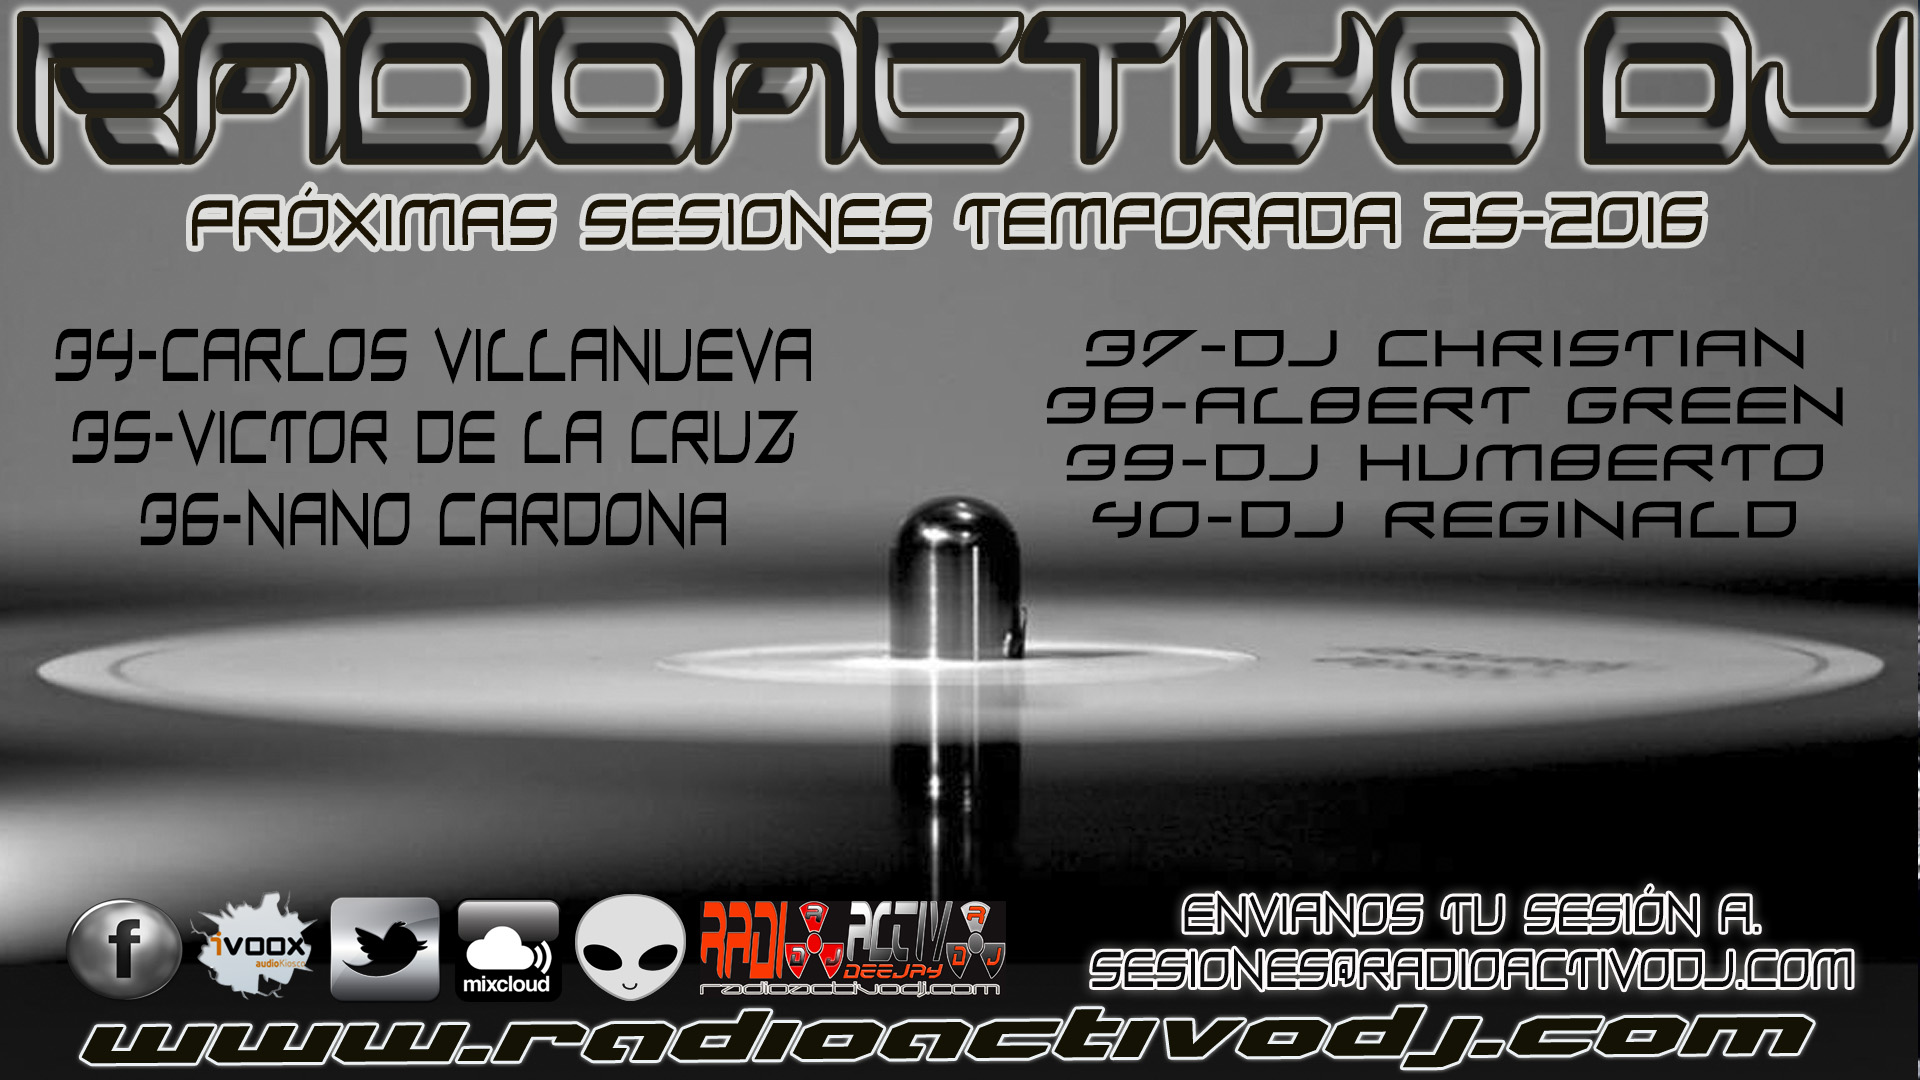 RADIOACTIVO-DJ-SESSIONS-2016-temp-25-1